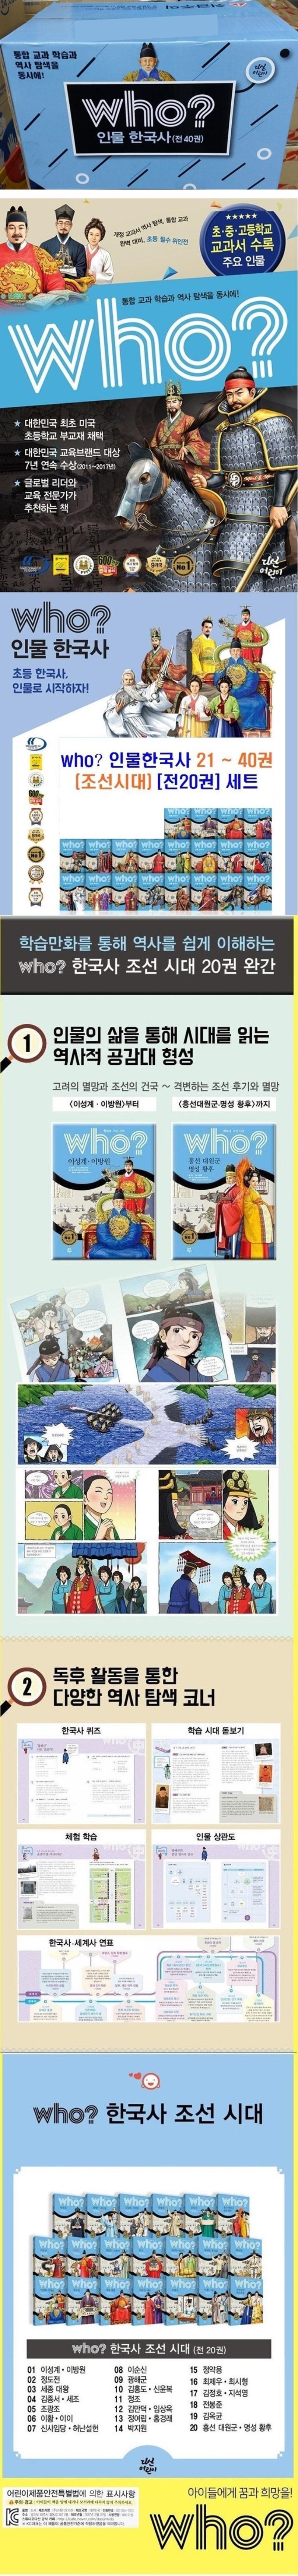 who_조선시대_20_ful-1.jpg